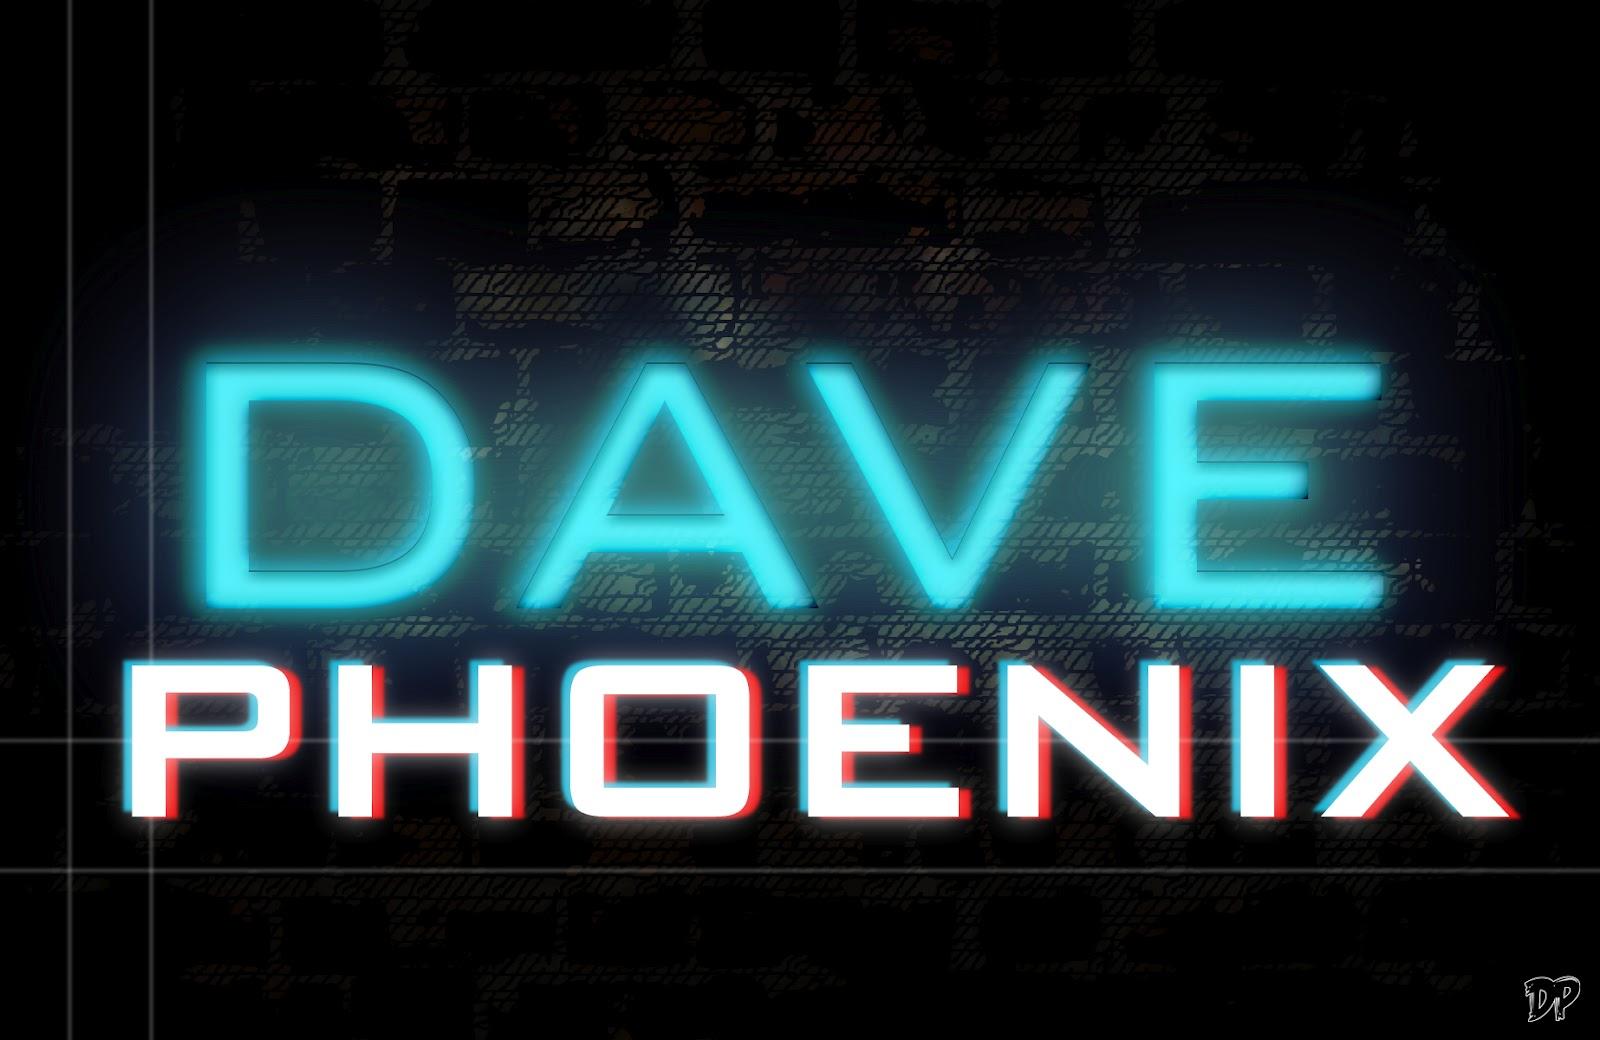 http://3.bp.blogspot.com/-m0r9sc87hsM/UBQM7JITT3I/AAAAAAAAA0M/MIAygeABwl8/s1600/Neon+Light+Test+by+Dave+Phoenix.jpg